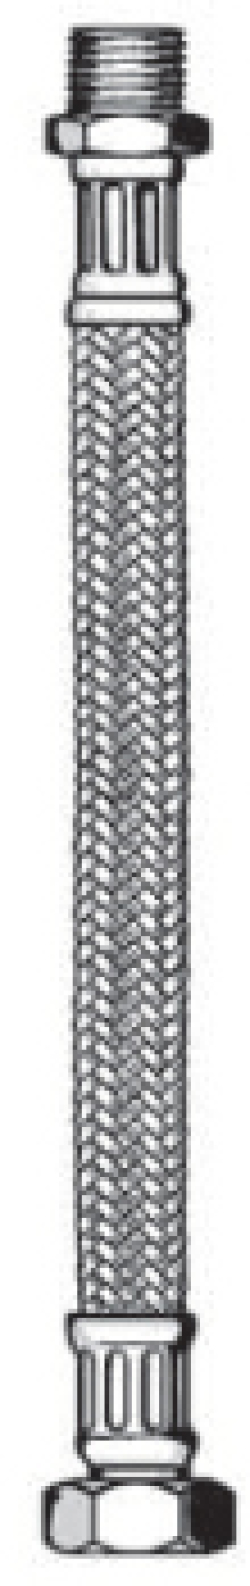 МЕ 5615.1104.50 Meiflex Dn13, 1/2 BPx1/2 HP, 500mm